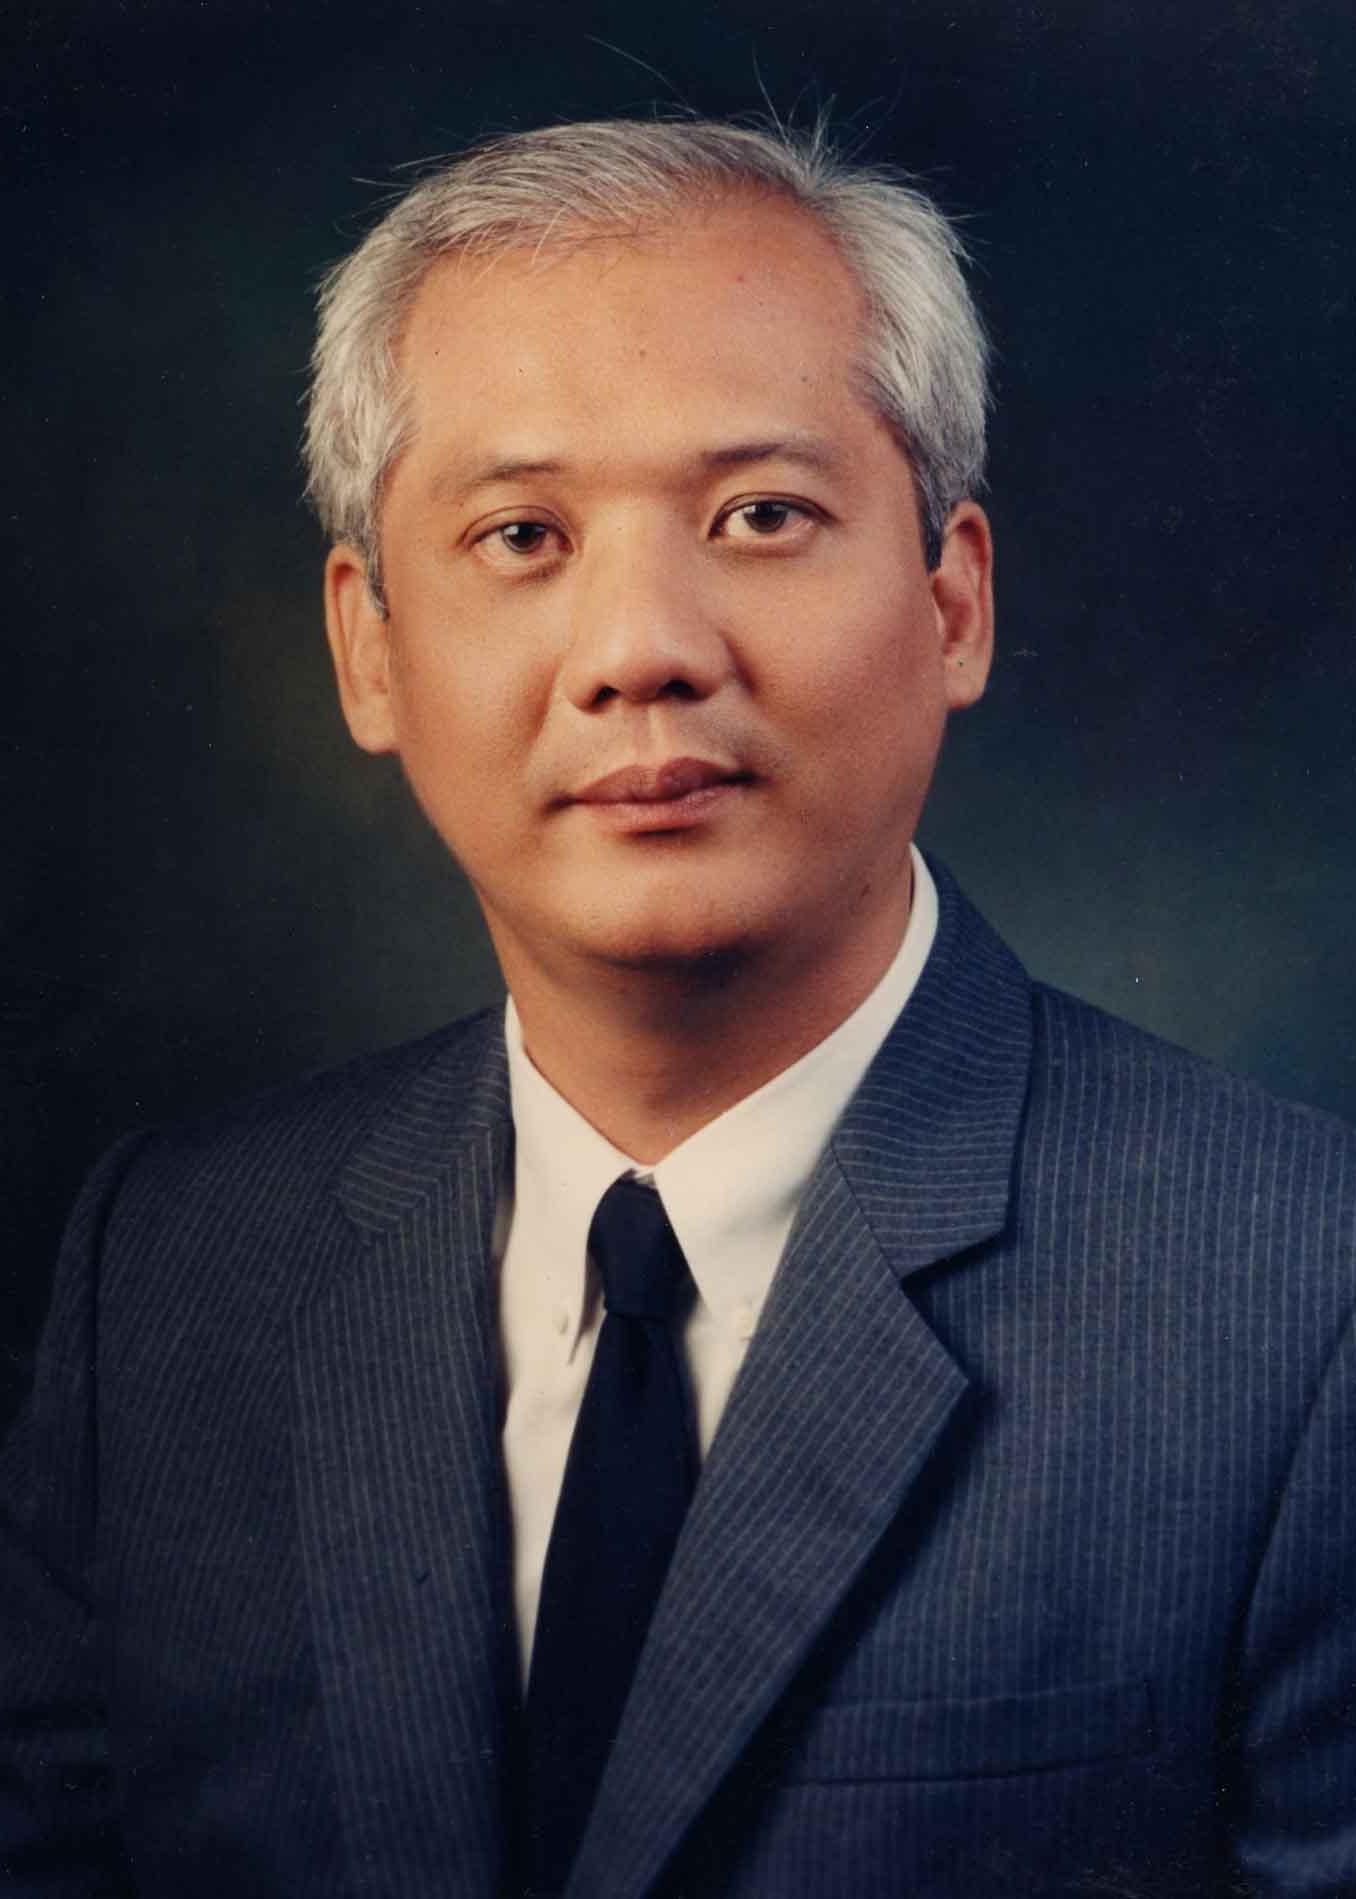 GrandMaster Choa Kok Sui, founder of Modern Pranic Healing & Arhatic Yoga